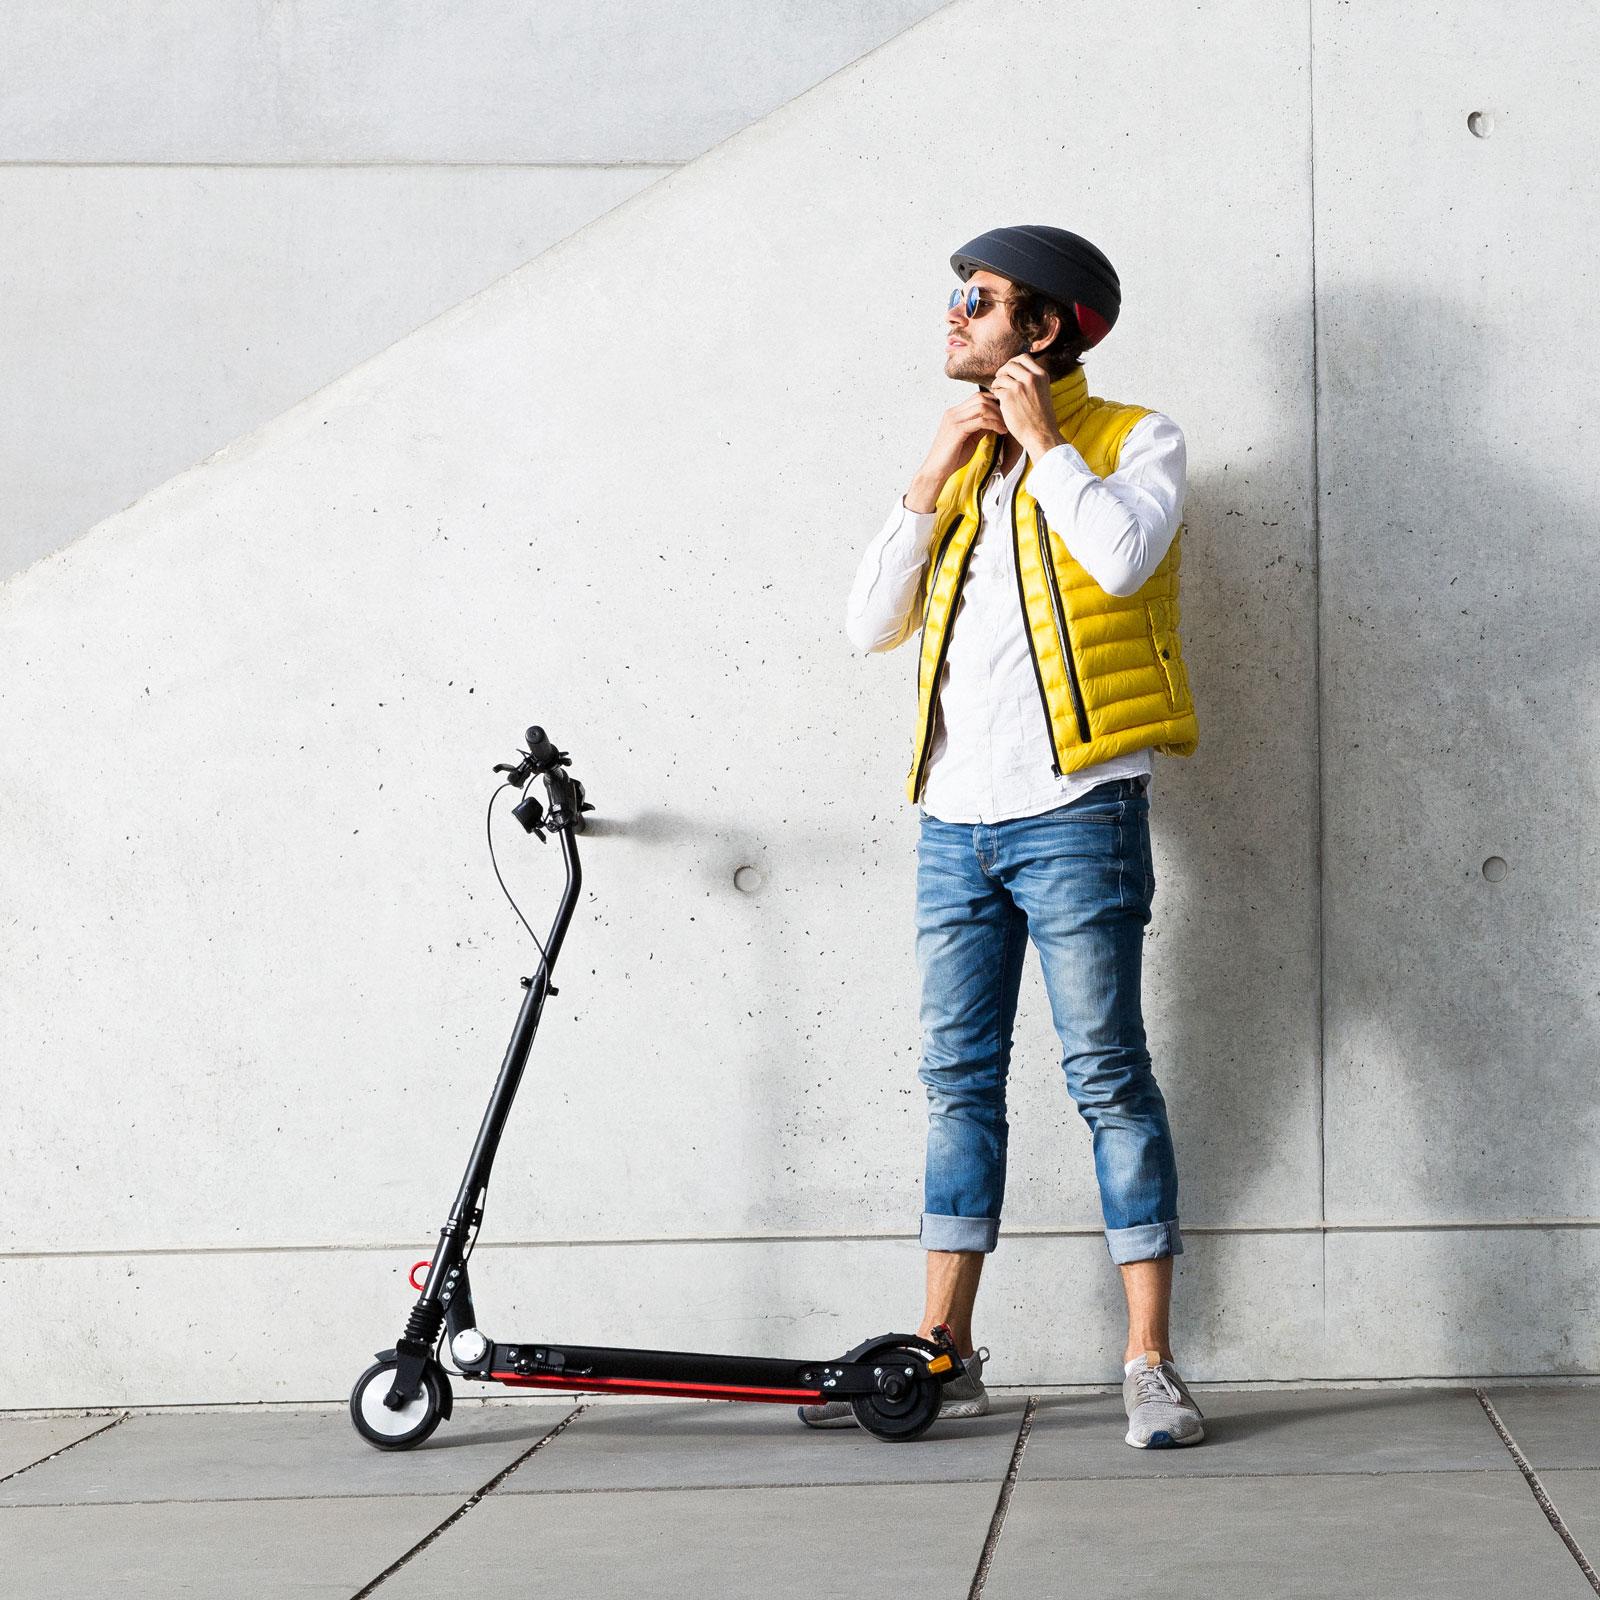 moovi-escooter-strassenzulassung-closca-escooter-helm-muenchen